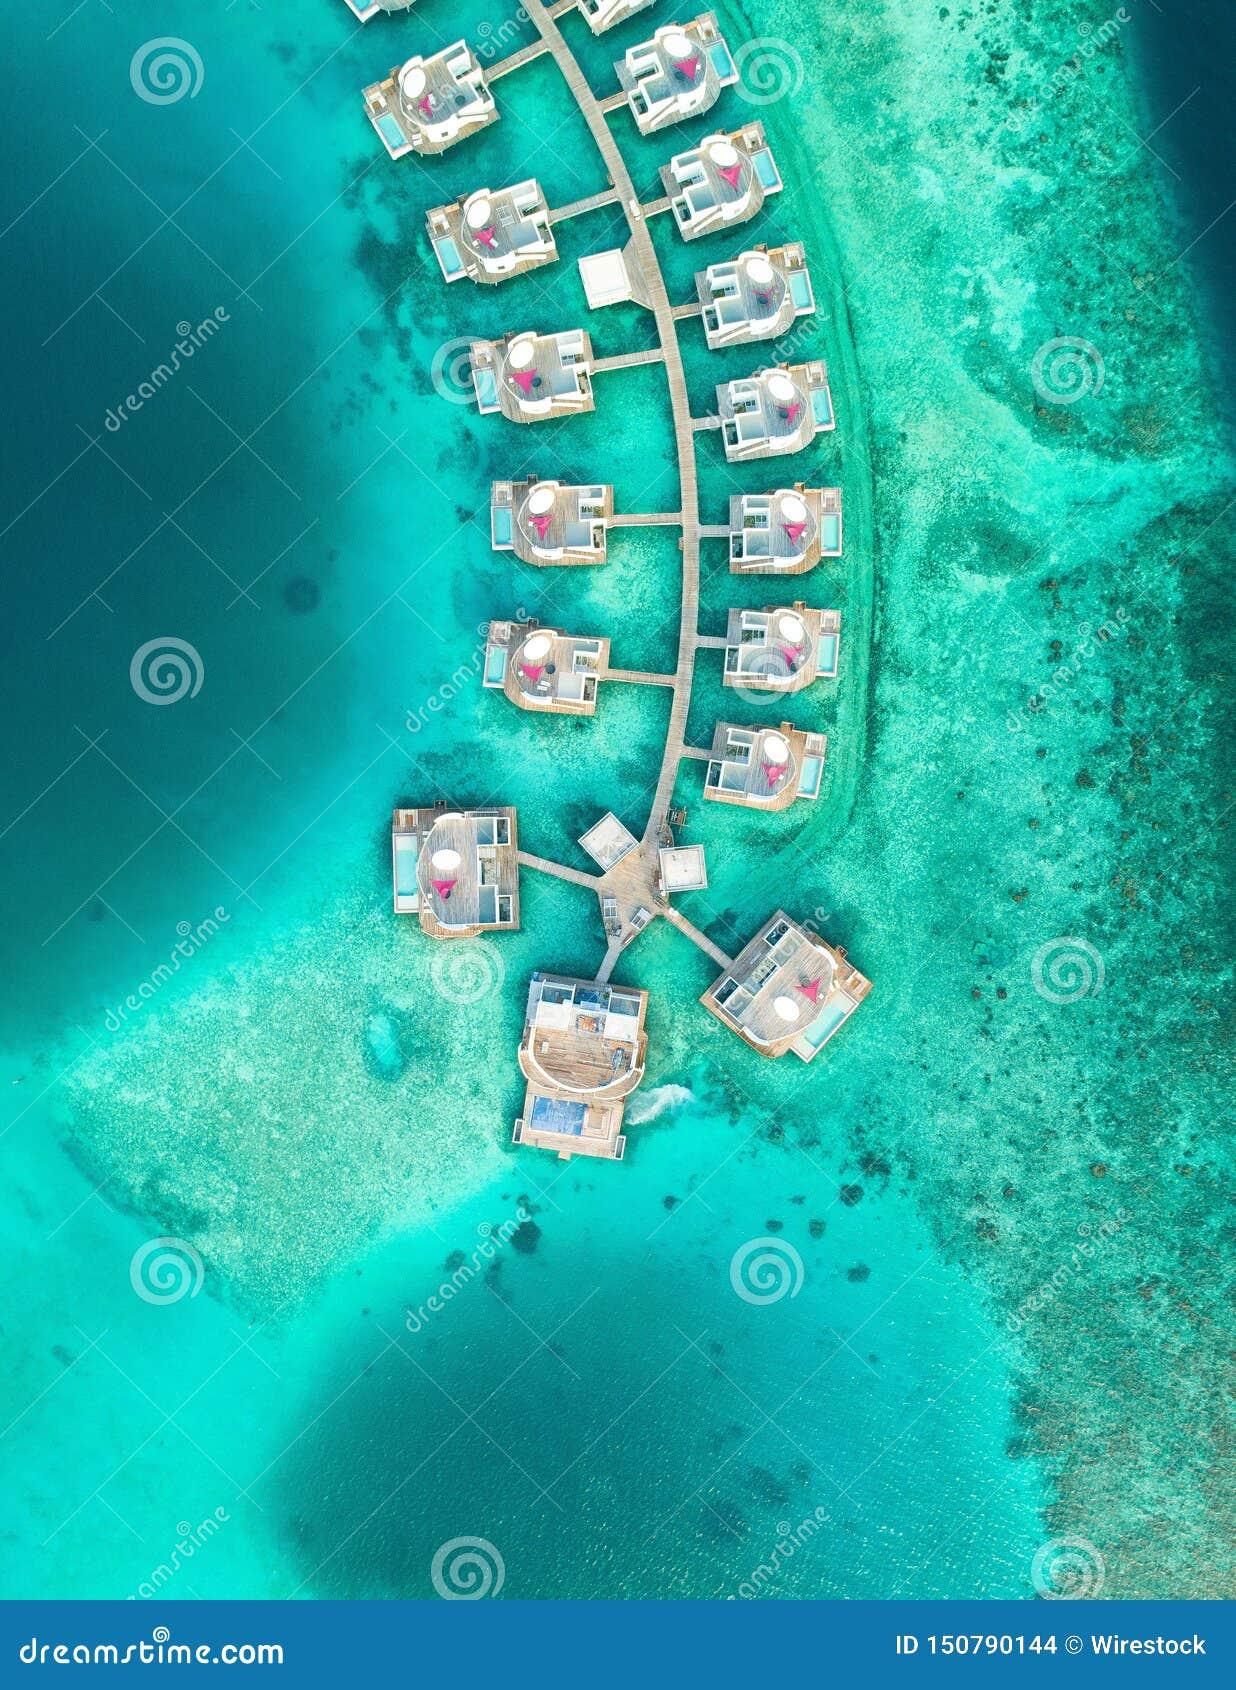 Tiro aéreo das casas construídas sobre o mar nas ilhas de Maldivas